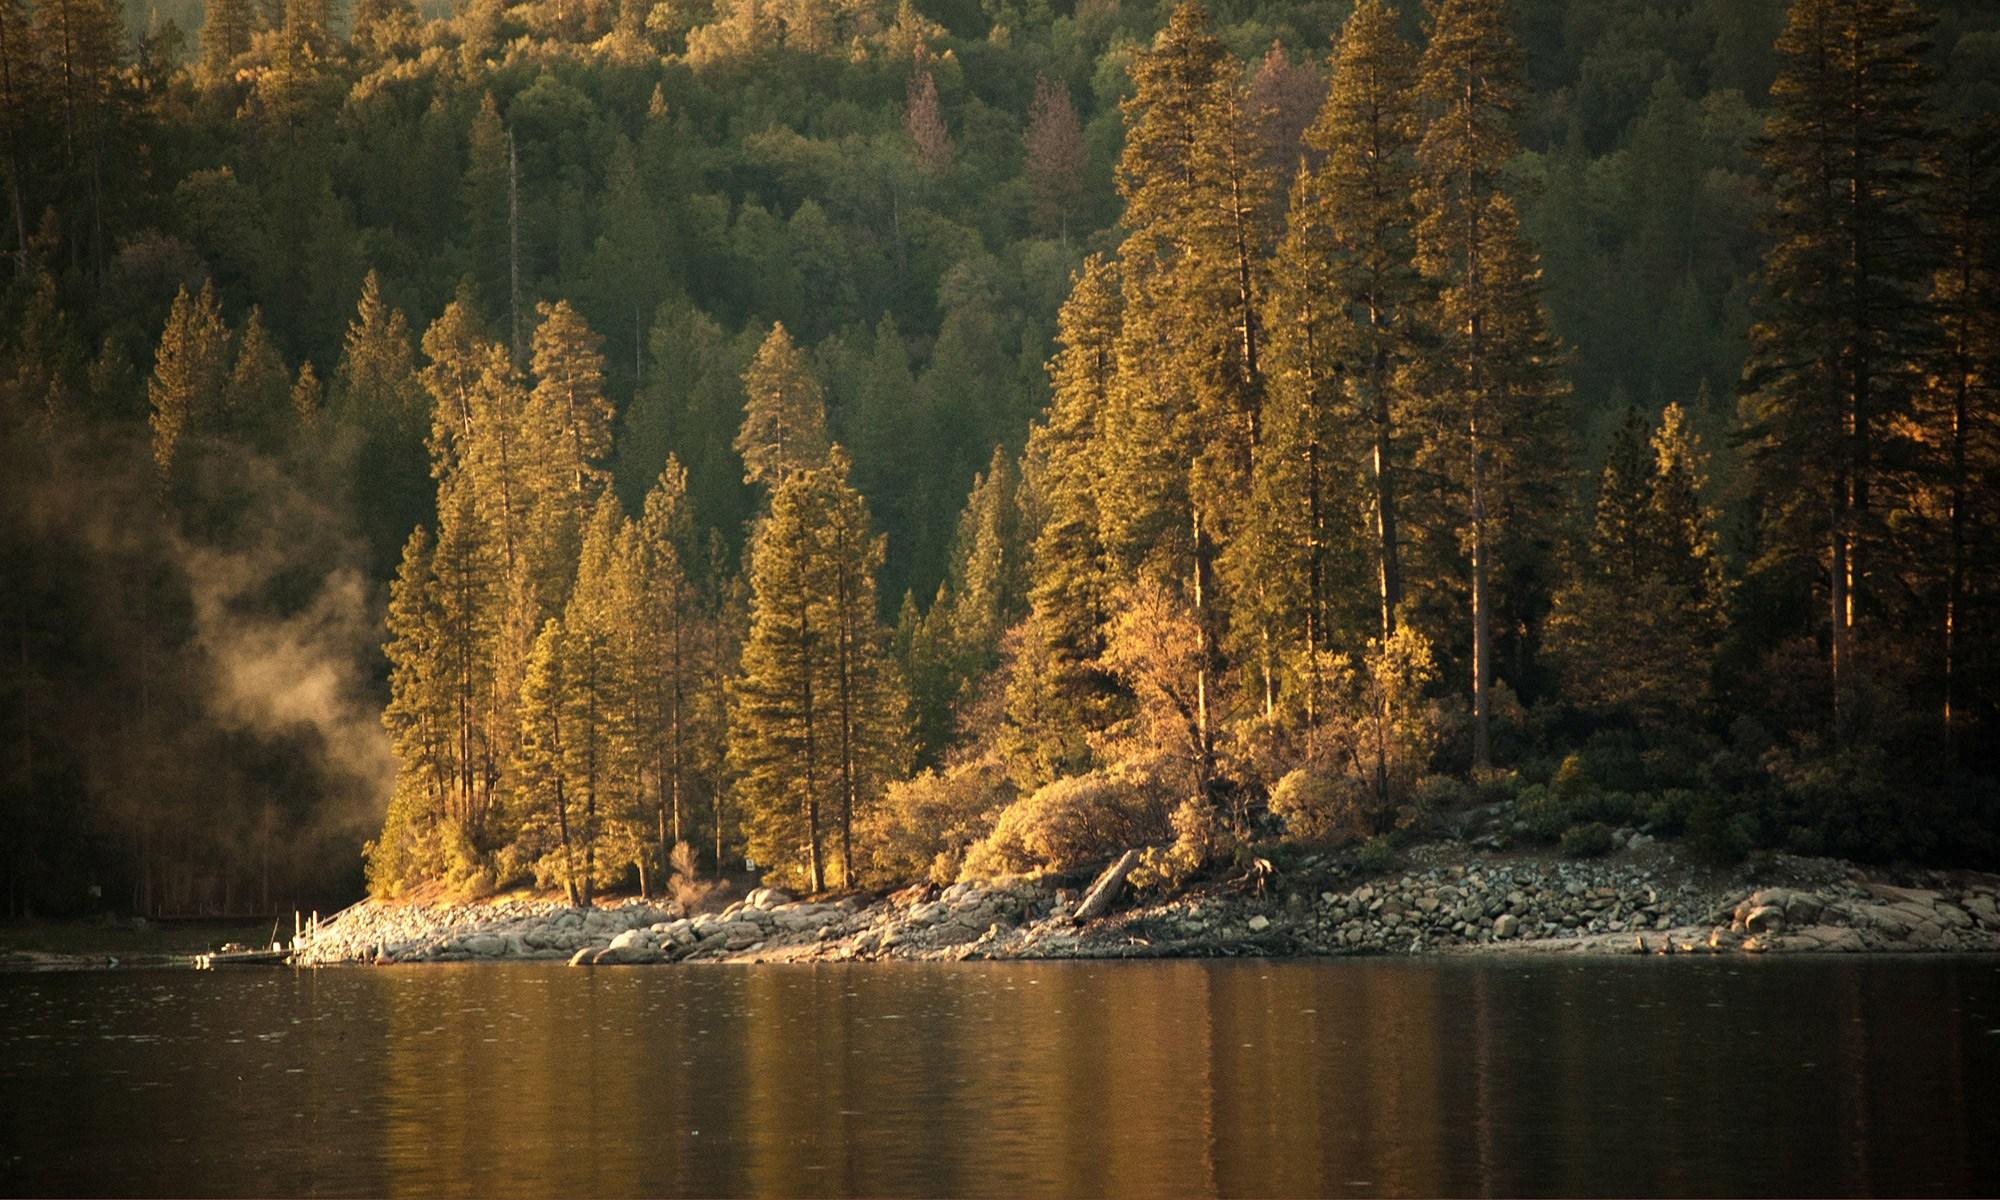 Hume lake with trees